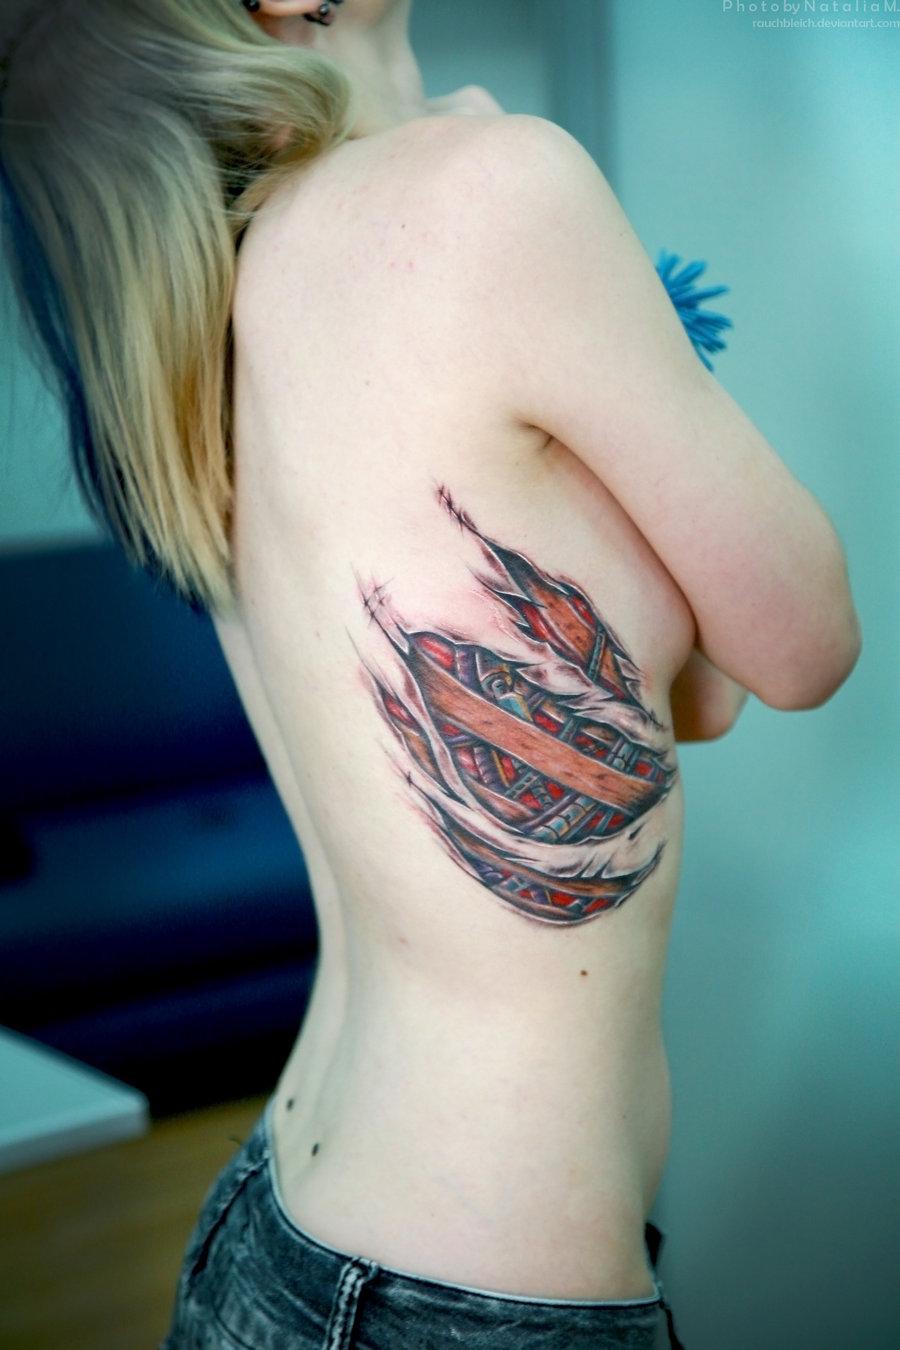 ТАТУ МАНИЯ тату надписи татуировки Галерея